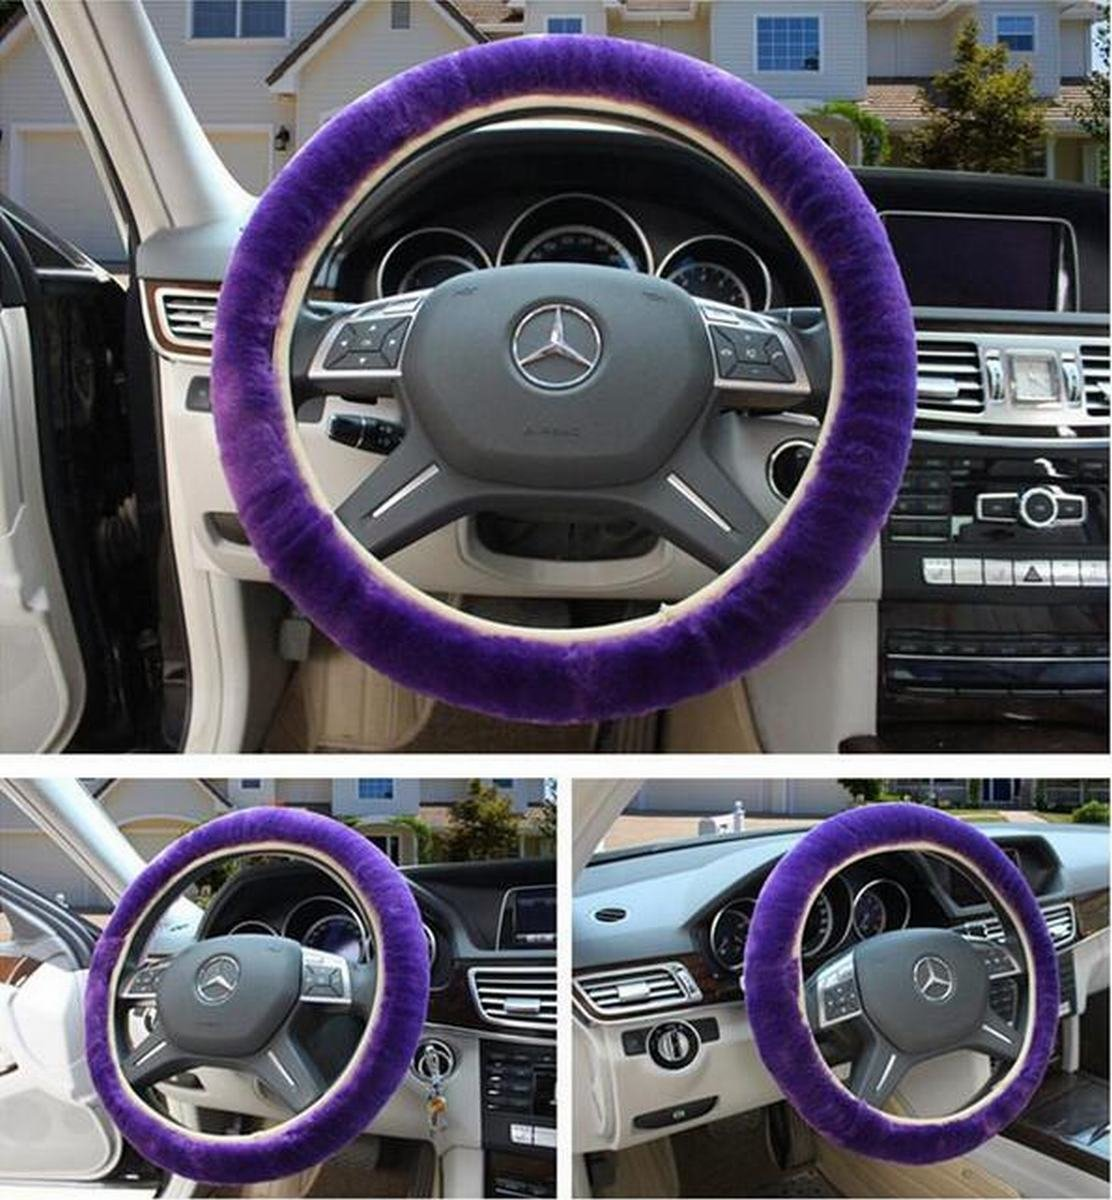 Lightweight Steering Wheel Covers Black OKAYDA Faux Wool High-Elastic Steering Wheel Cover Fits Tight on Wheel Warm Hands in Winter Absorb Hand Sweat in Summer